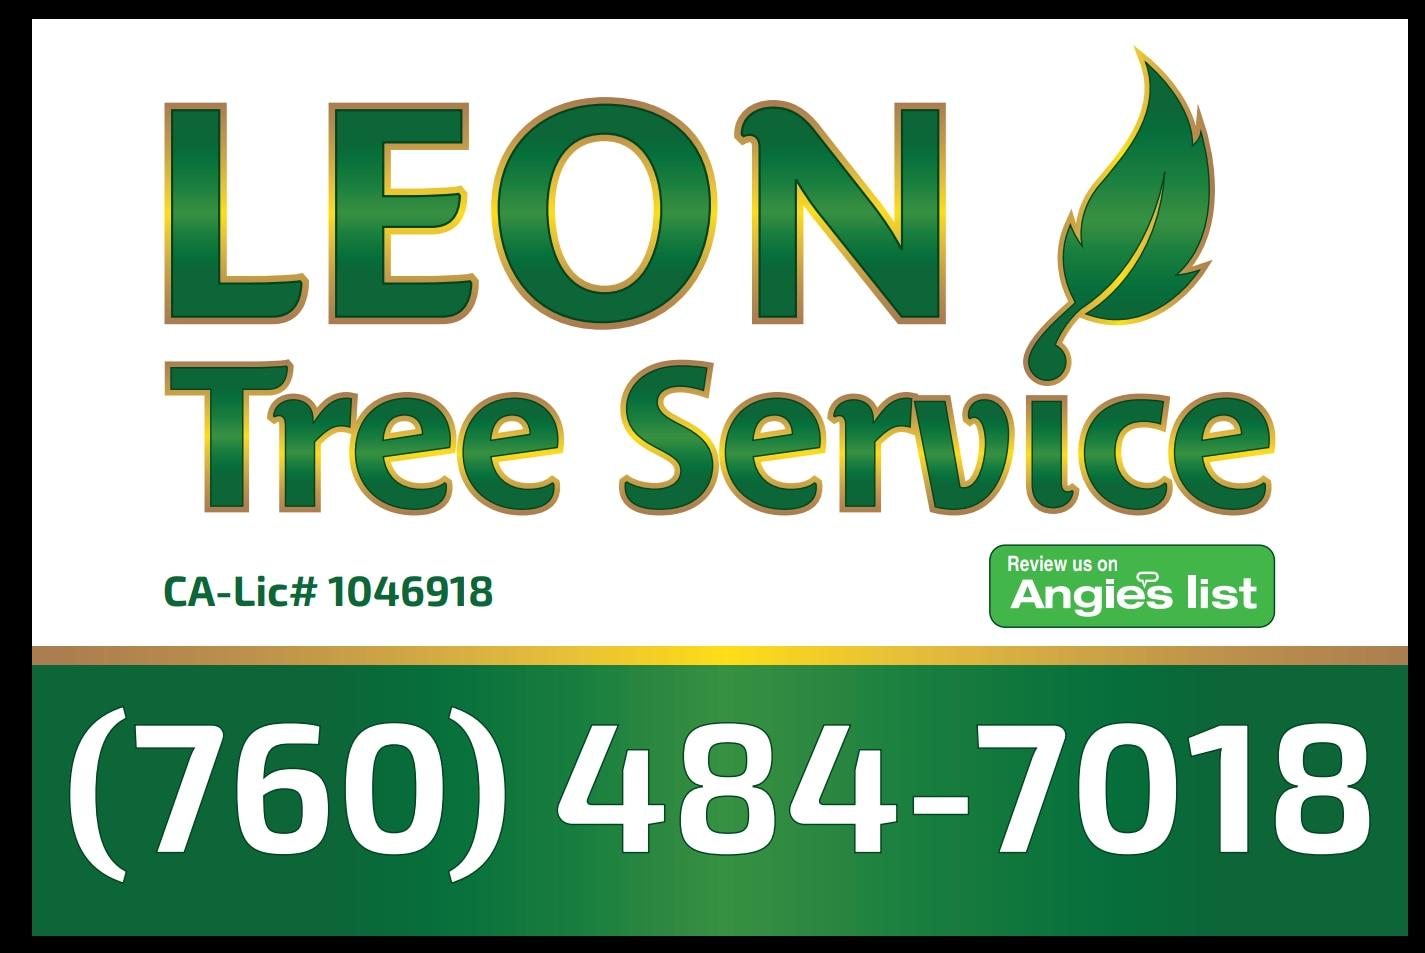 Leon Tree Service